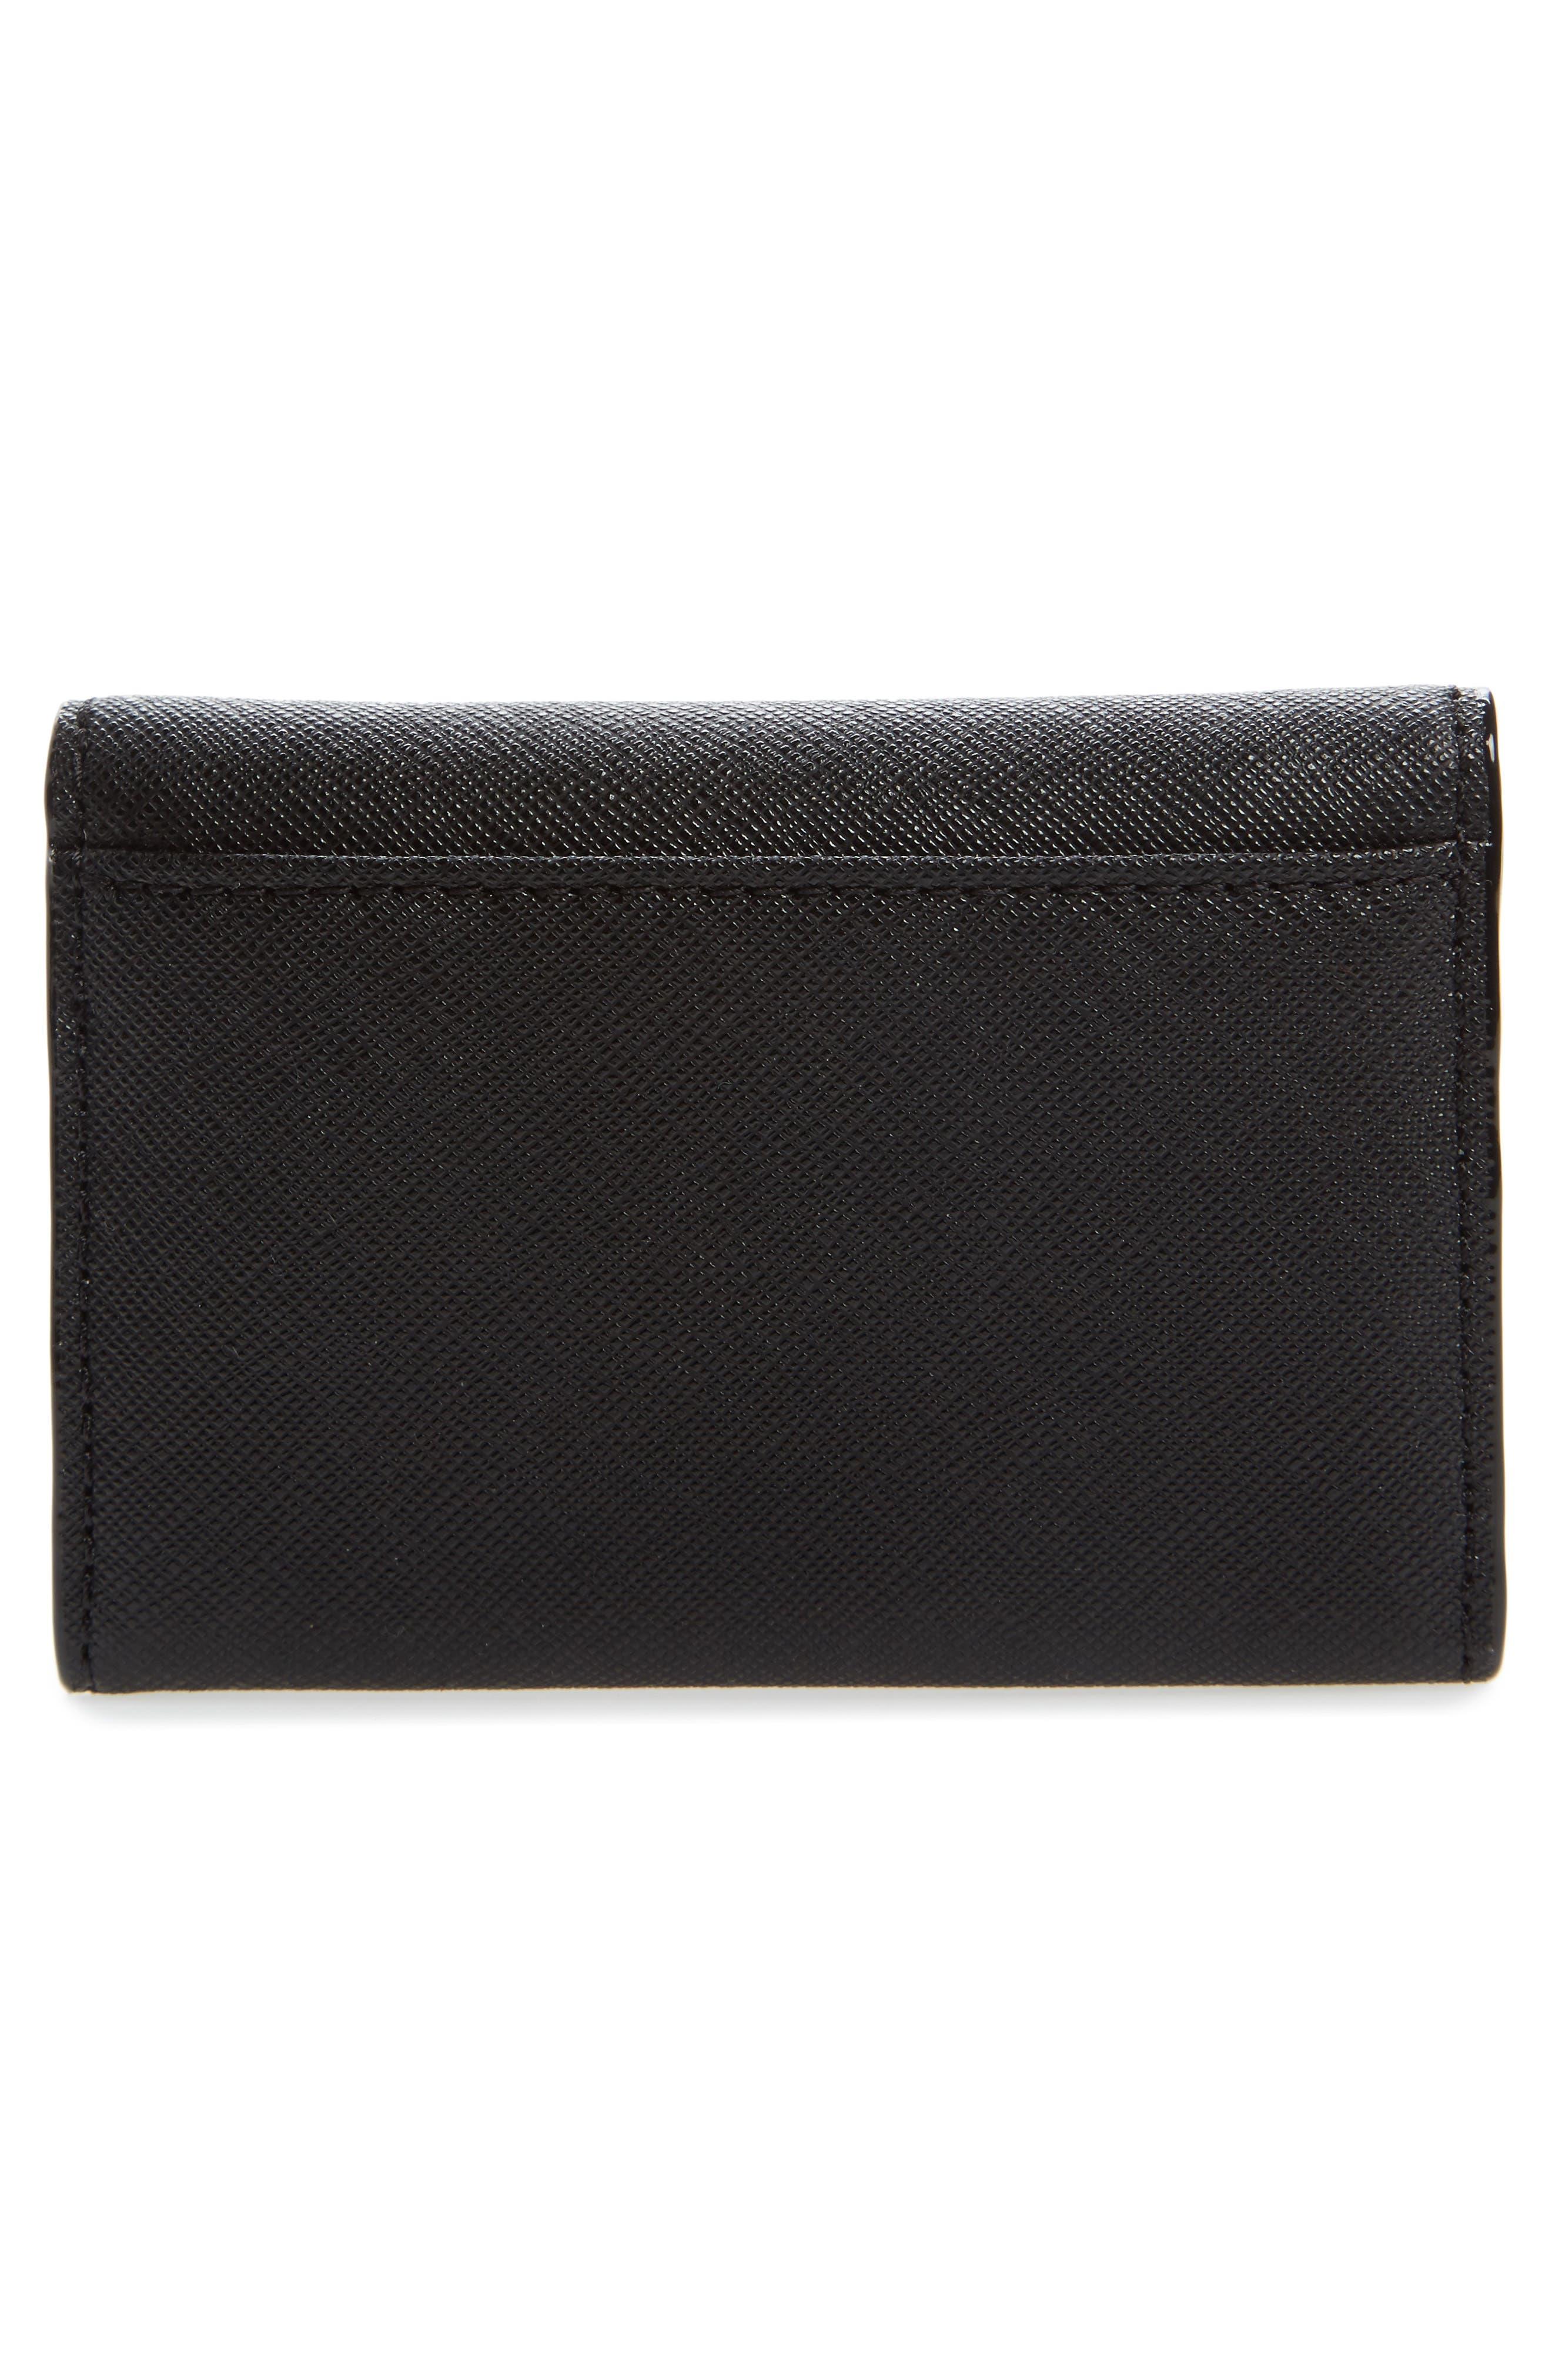 cameron street - farren leather card case,                             Alternate thumbnail 2, color,                             001